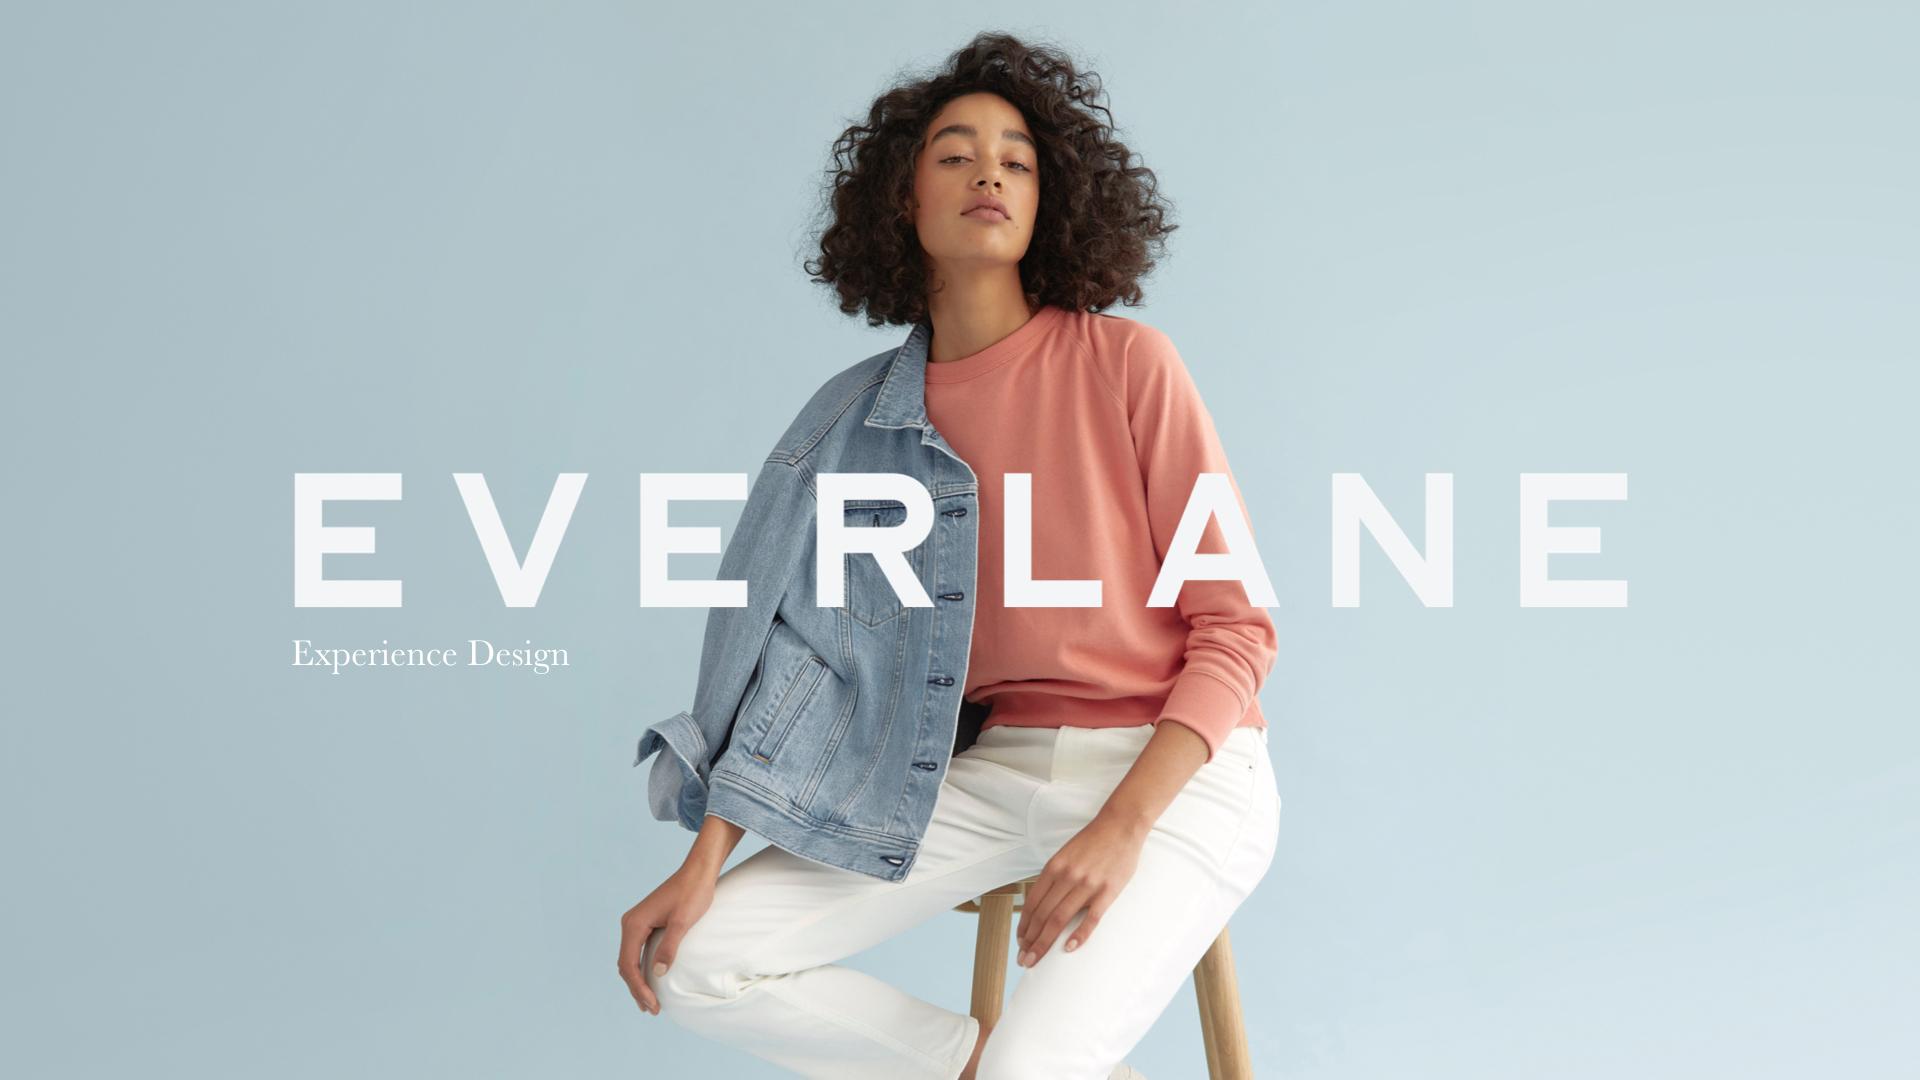 Everlane: A UX Casestudy - snigdha pamula